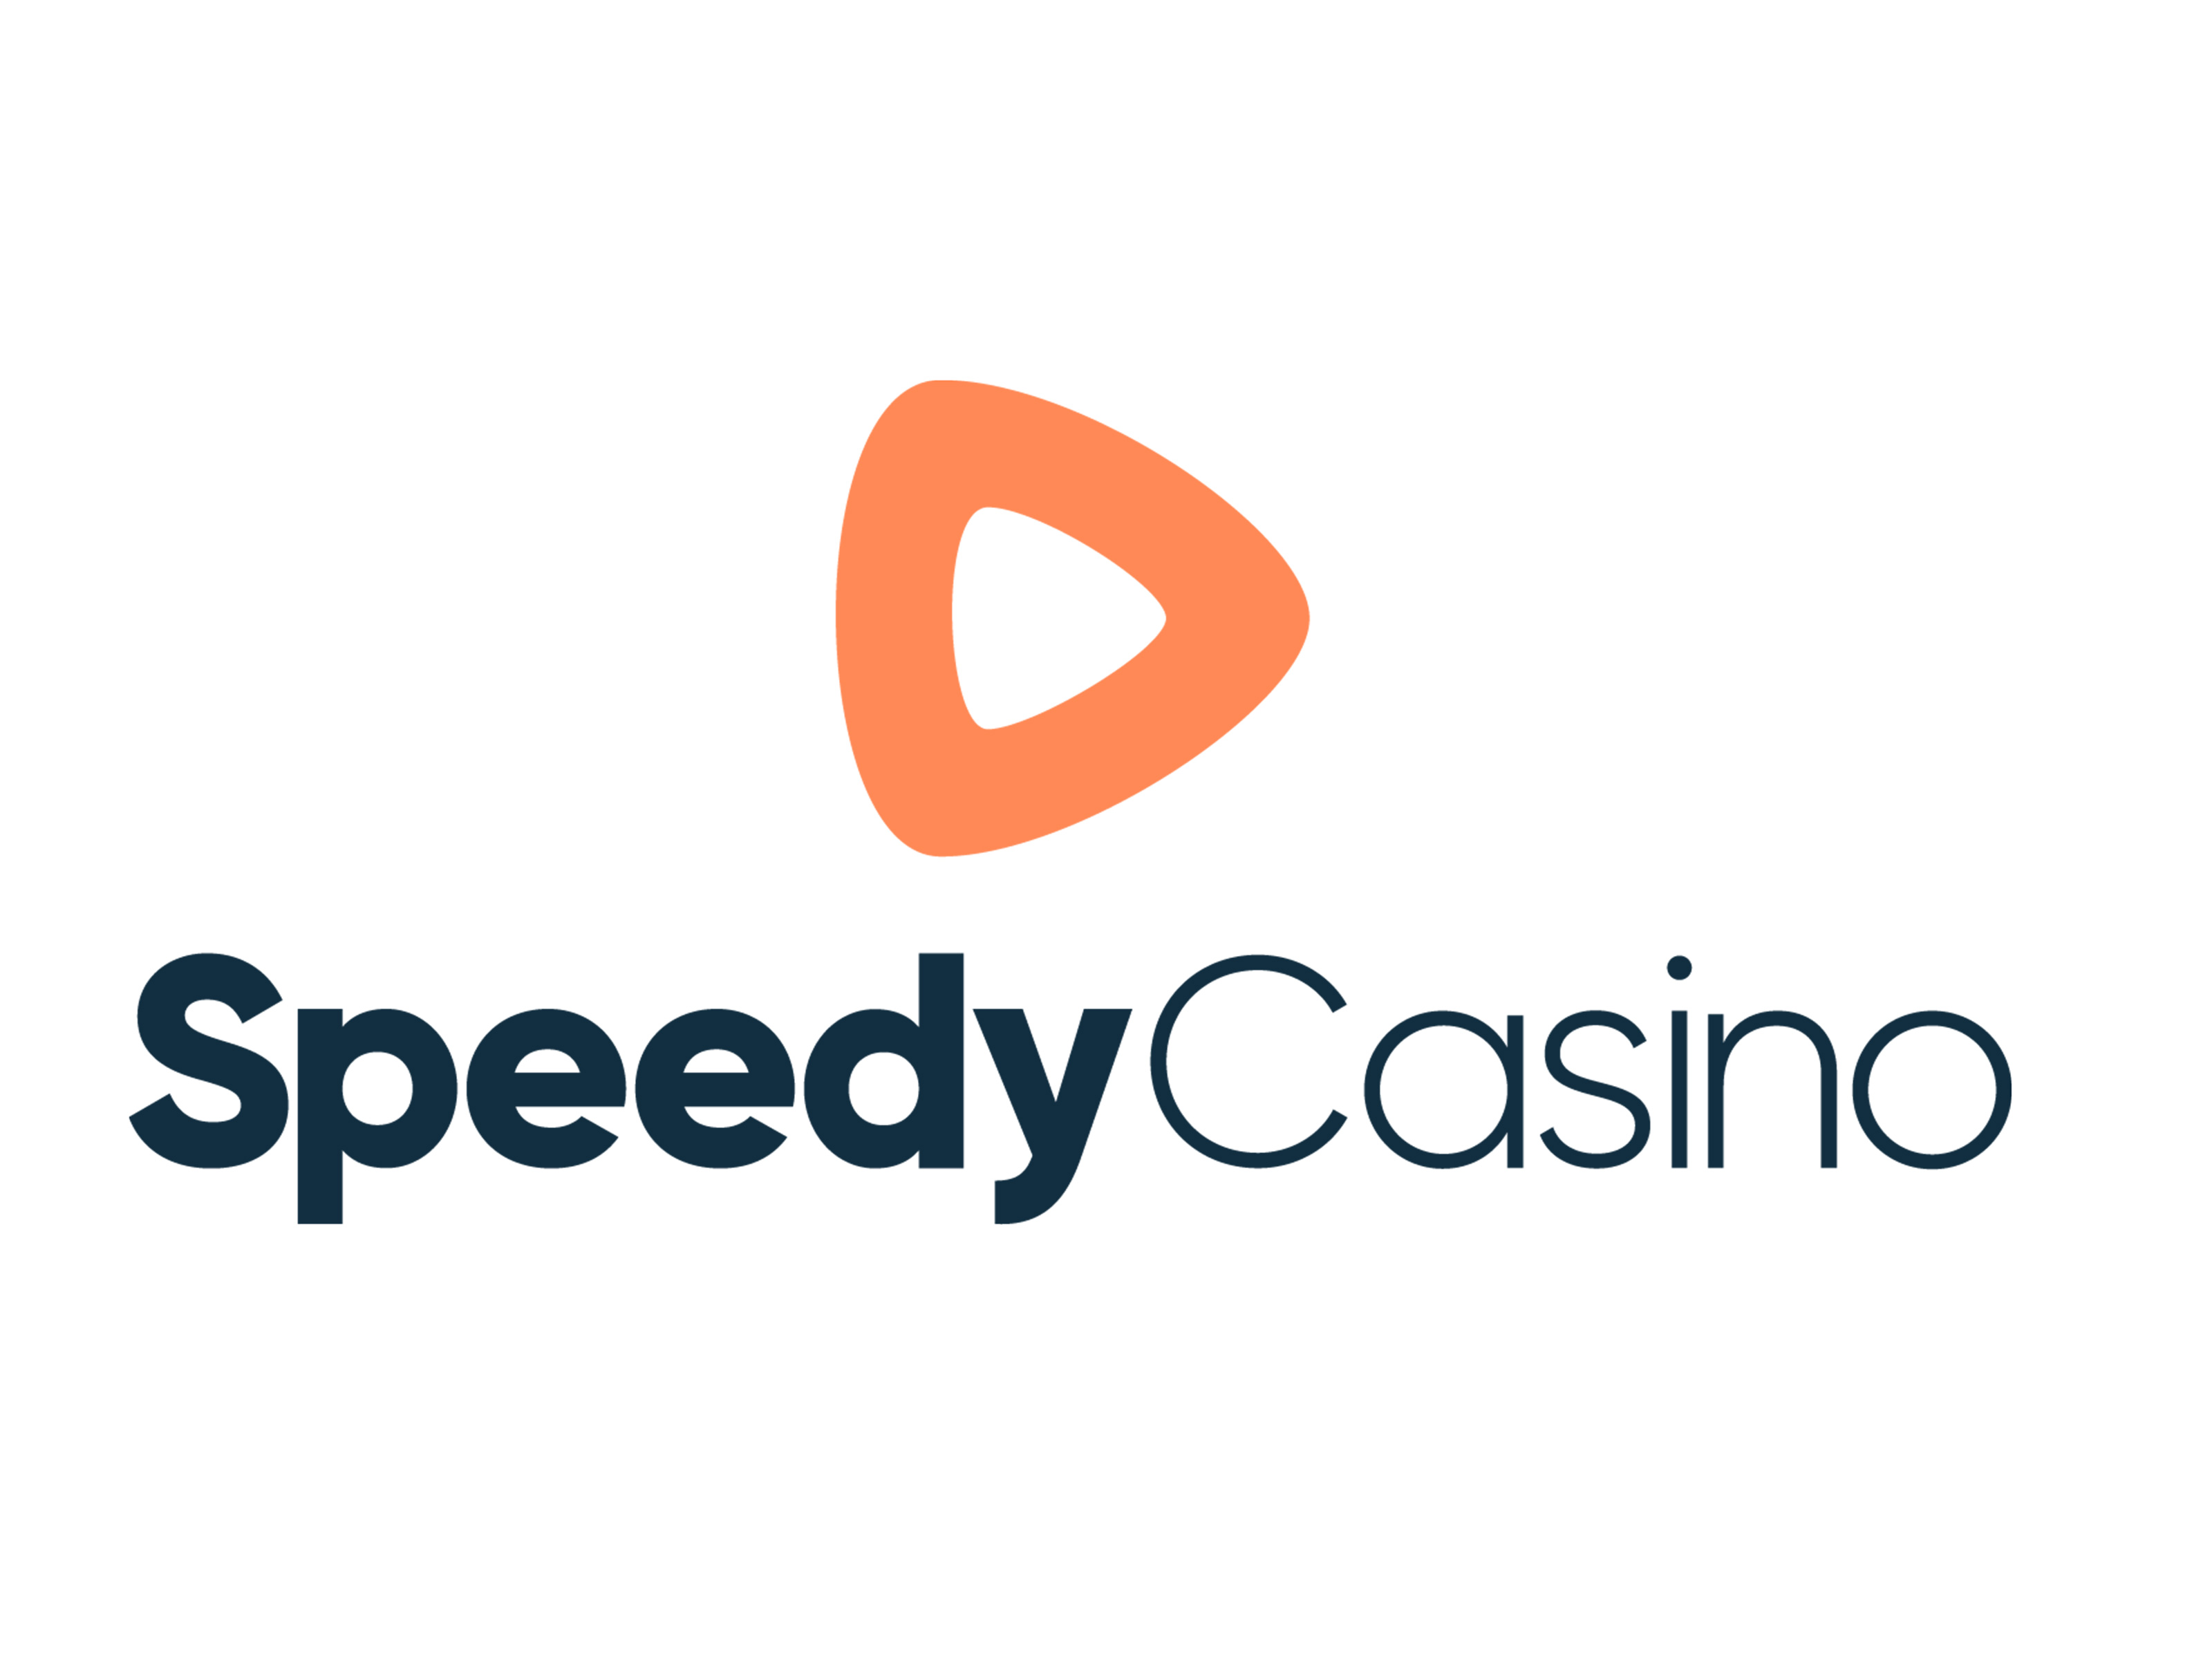 Speedy casino logga